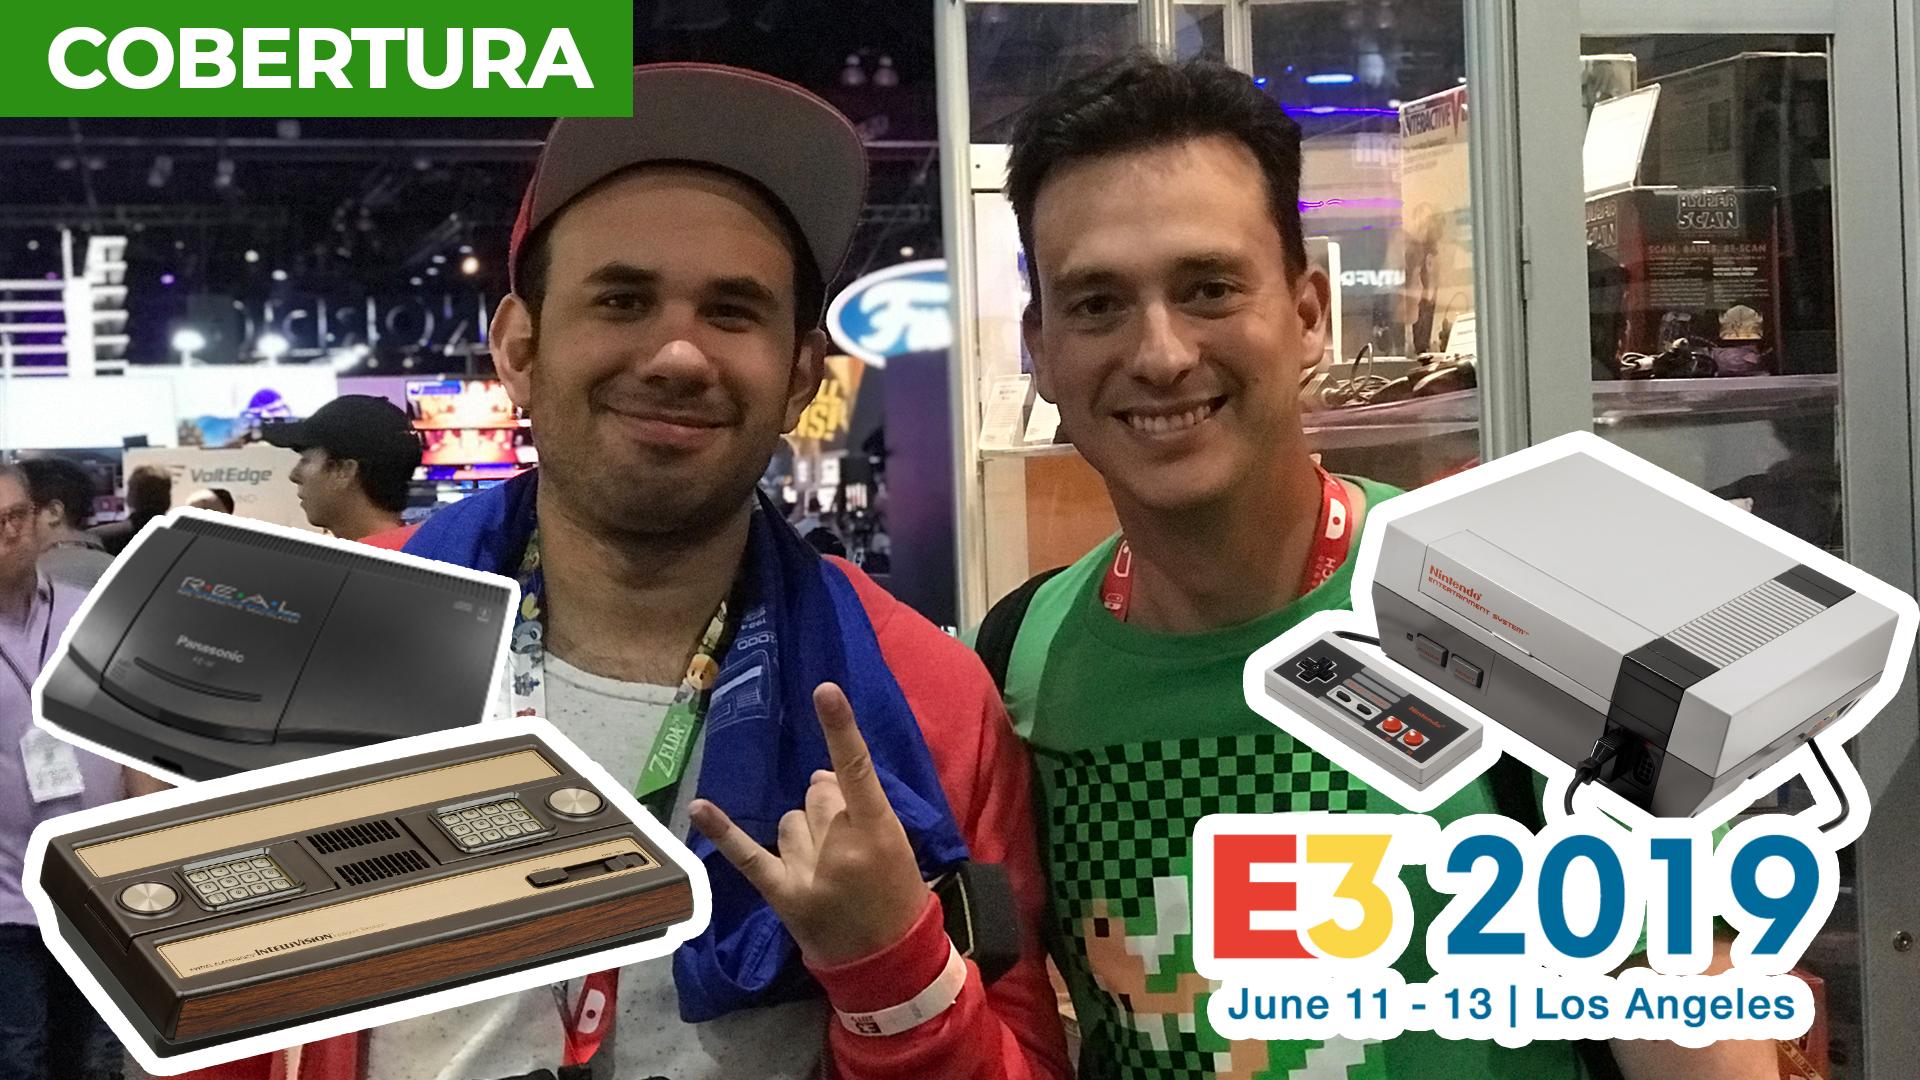 Consolas que posiblemente no conocías – Museo del videojuego en E3 2019